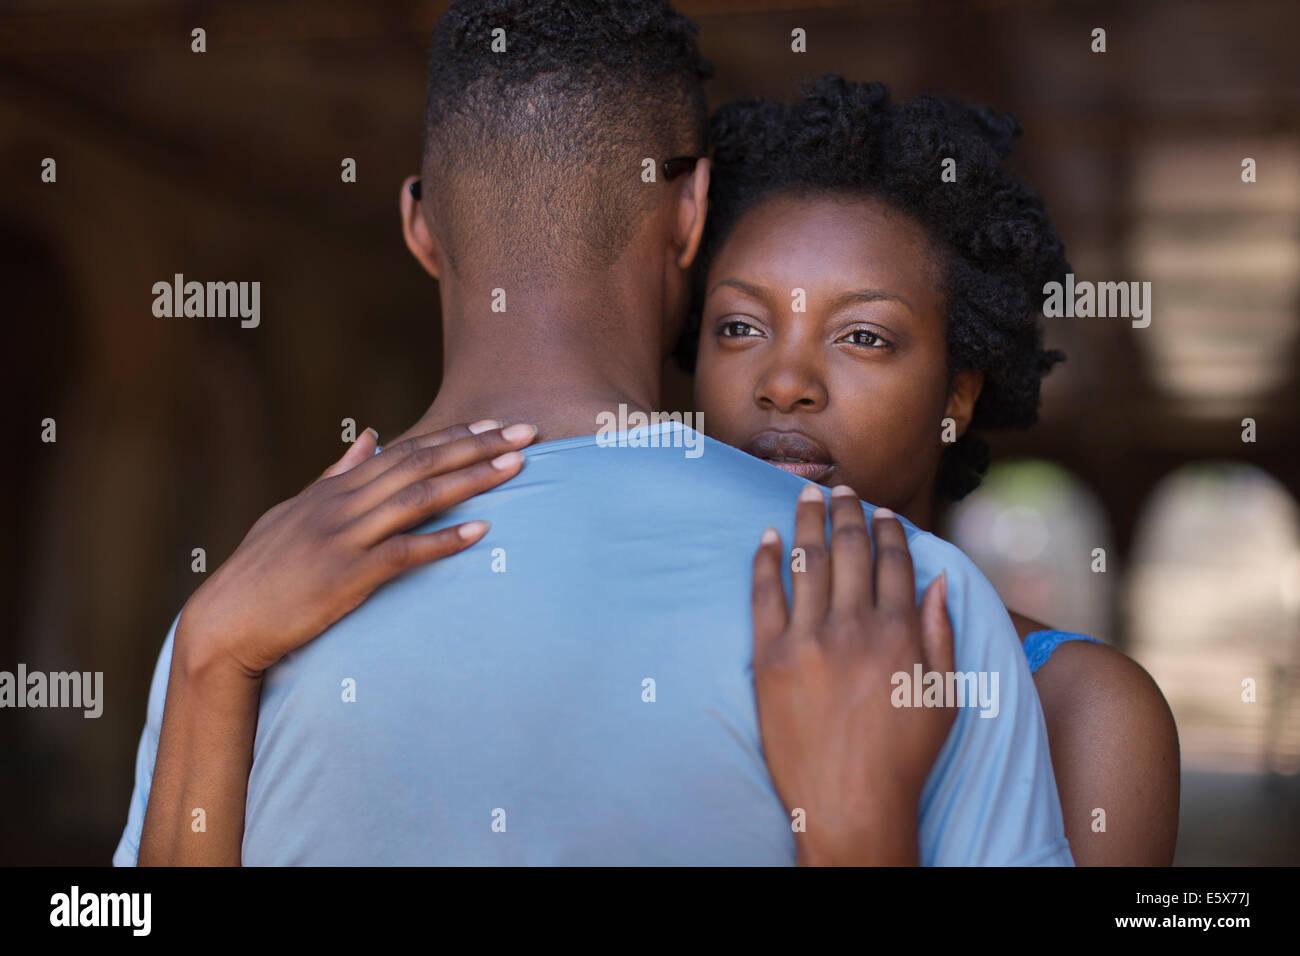 Jeune couple hugging in Bethesda Terrace arcade, Central Park, New York City, USA Photo Stock